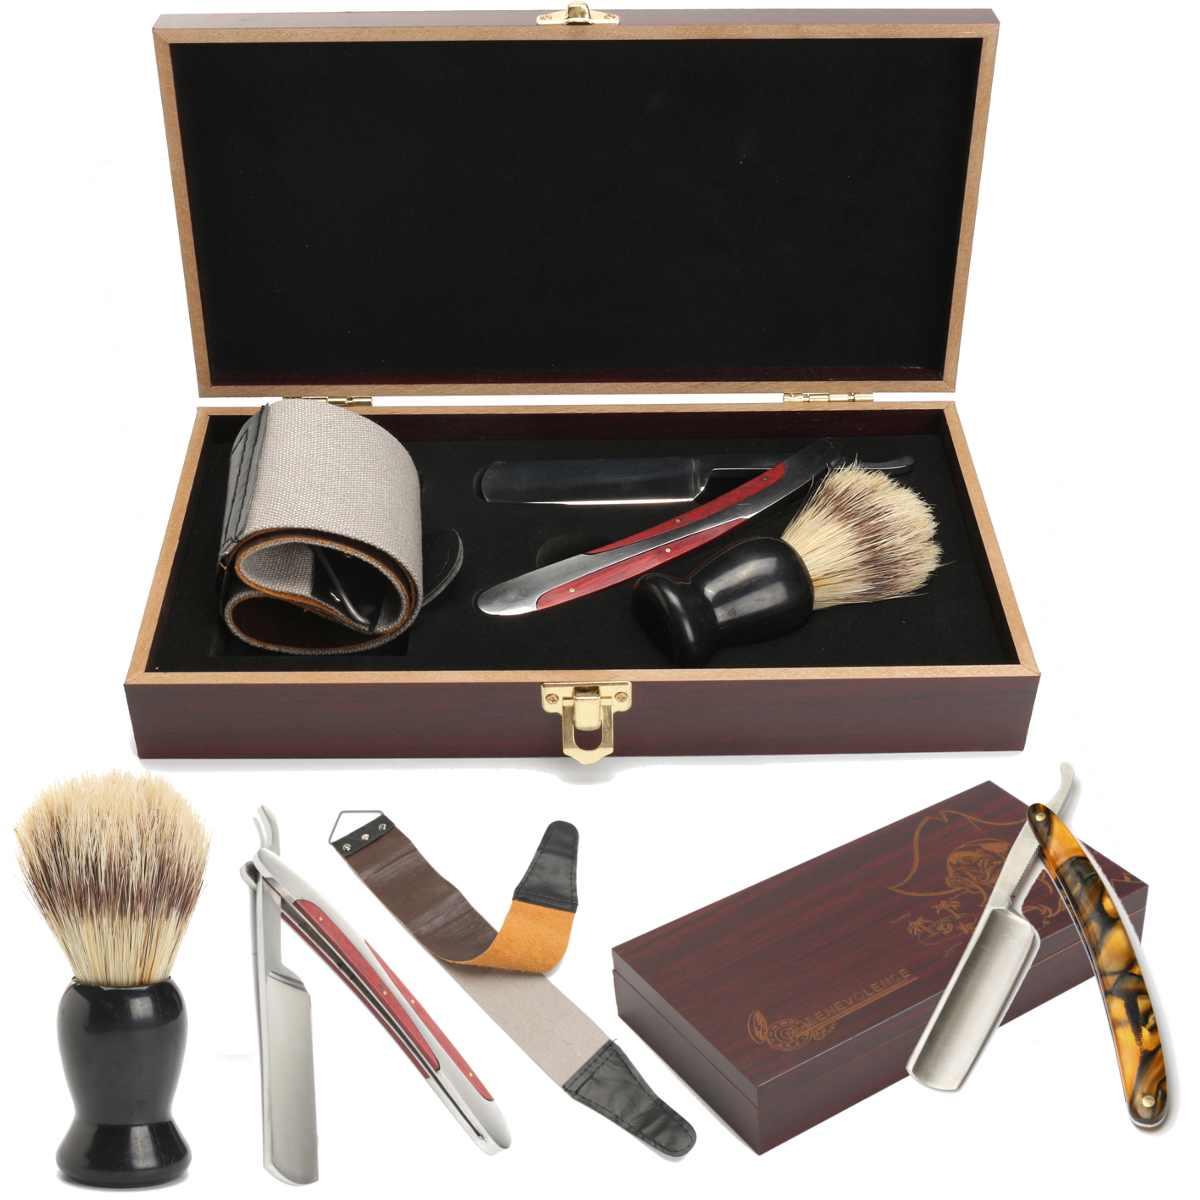 4Pcs/set Vintage Manual Shaver Kits With Wooden Box Gifts Barber Holder Folding Shaving Knife Shave Beard Cutter